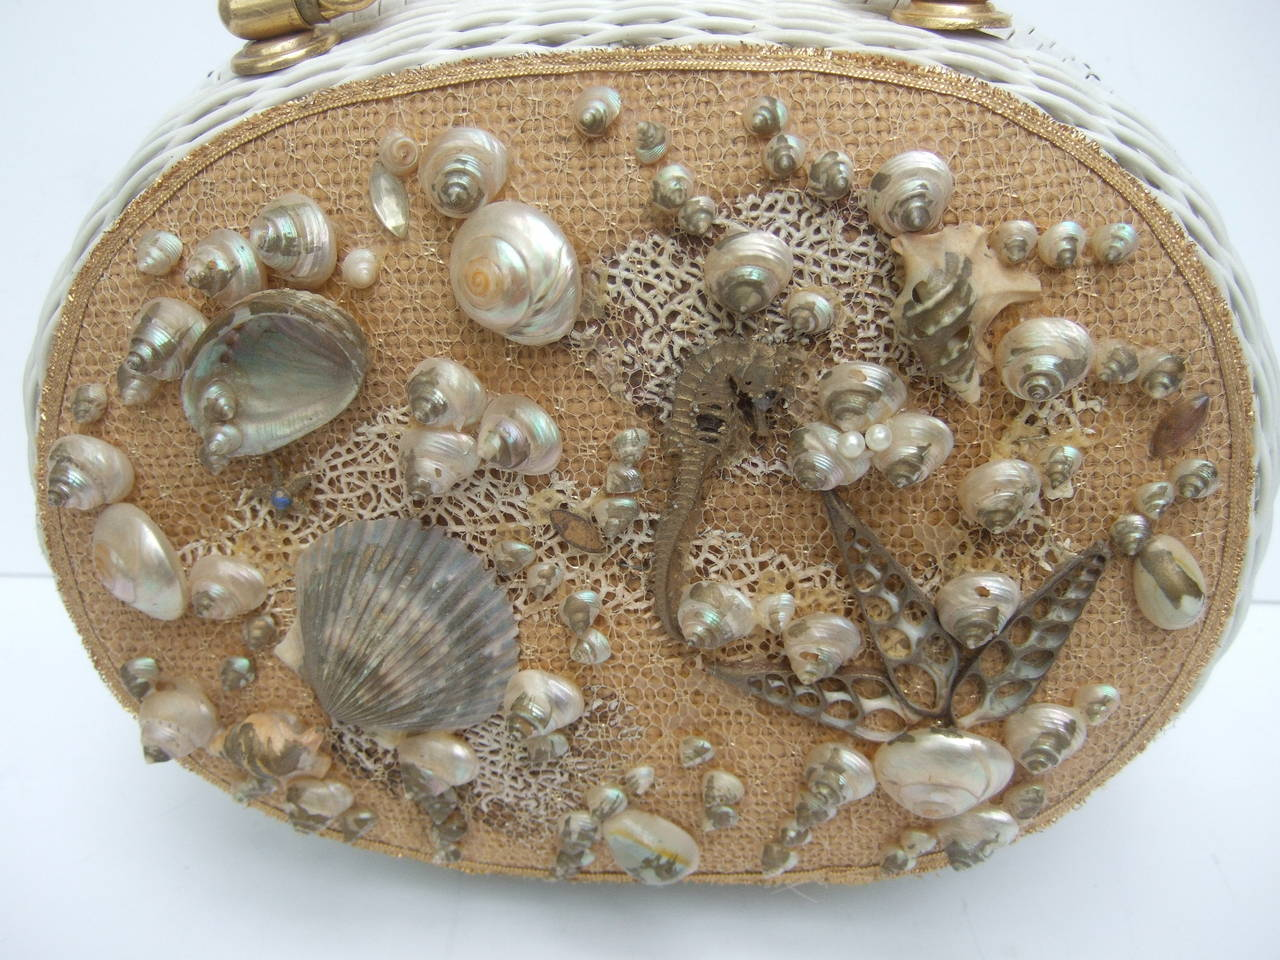 Posh Sea Shell White Wicker Retro Handbag c 1960 4